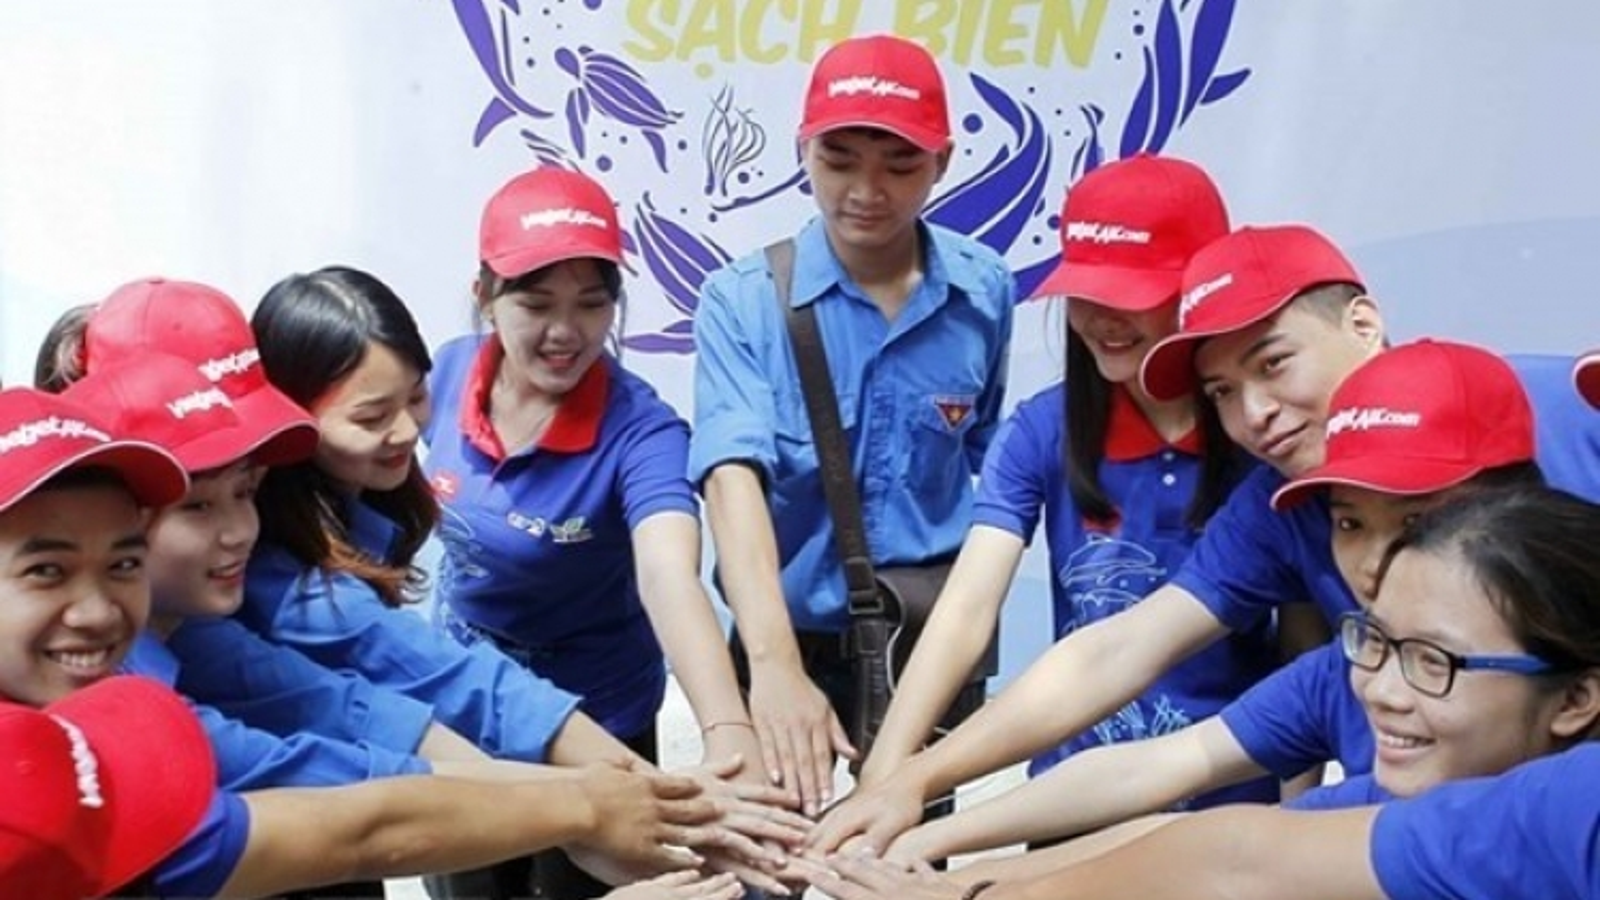 Youths confident in Vietnam's future development: Survey